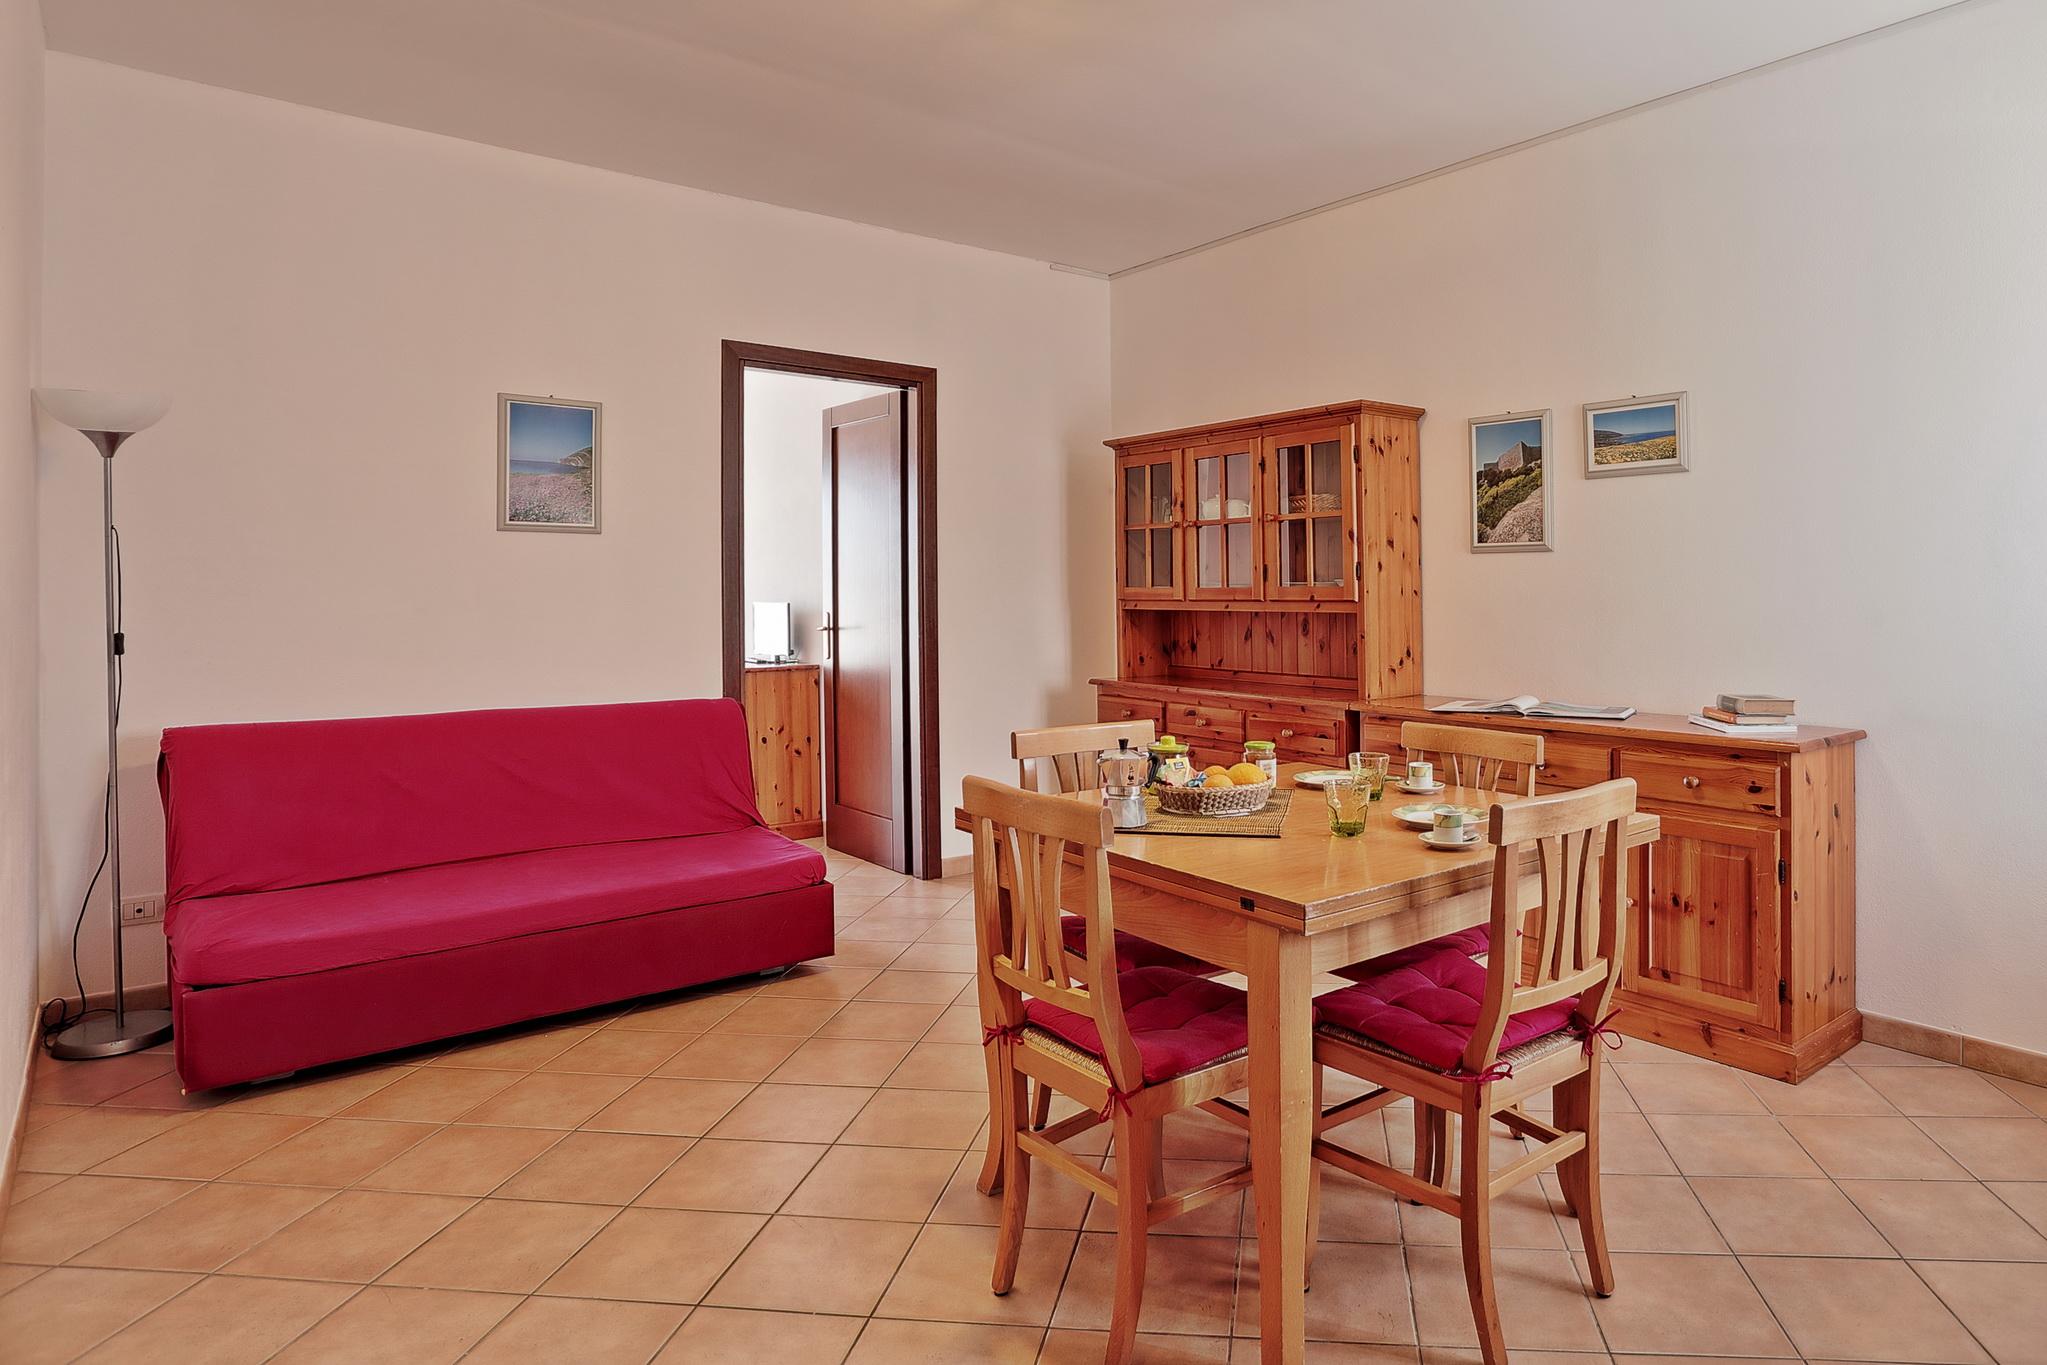 Standard con patio interno (6)